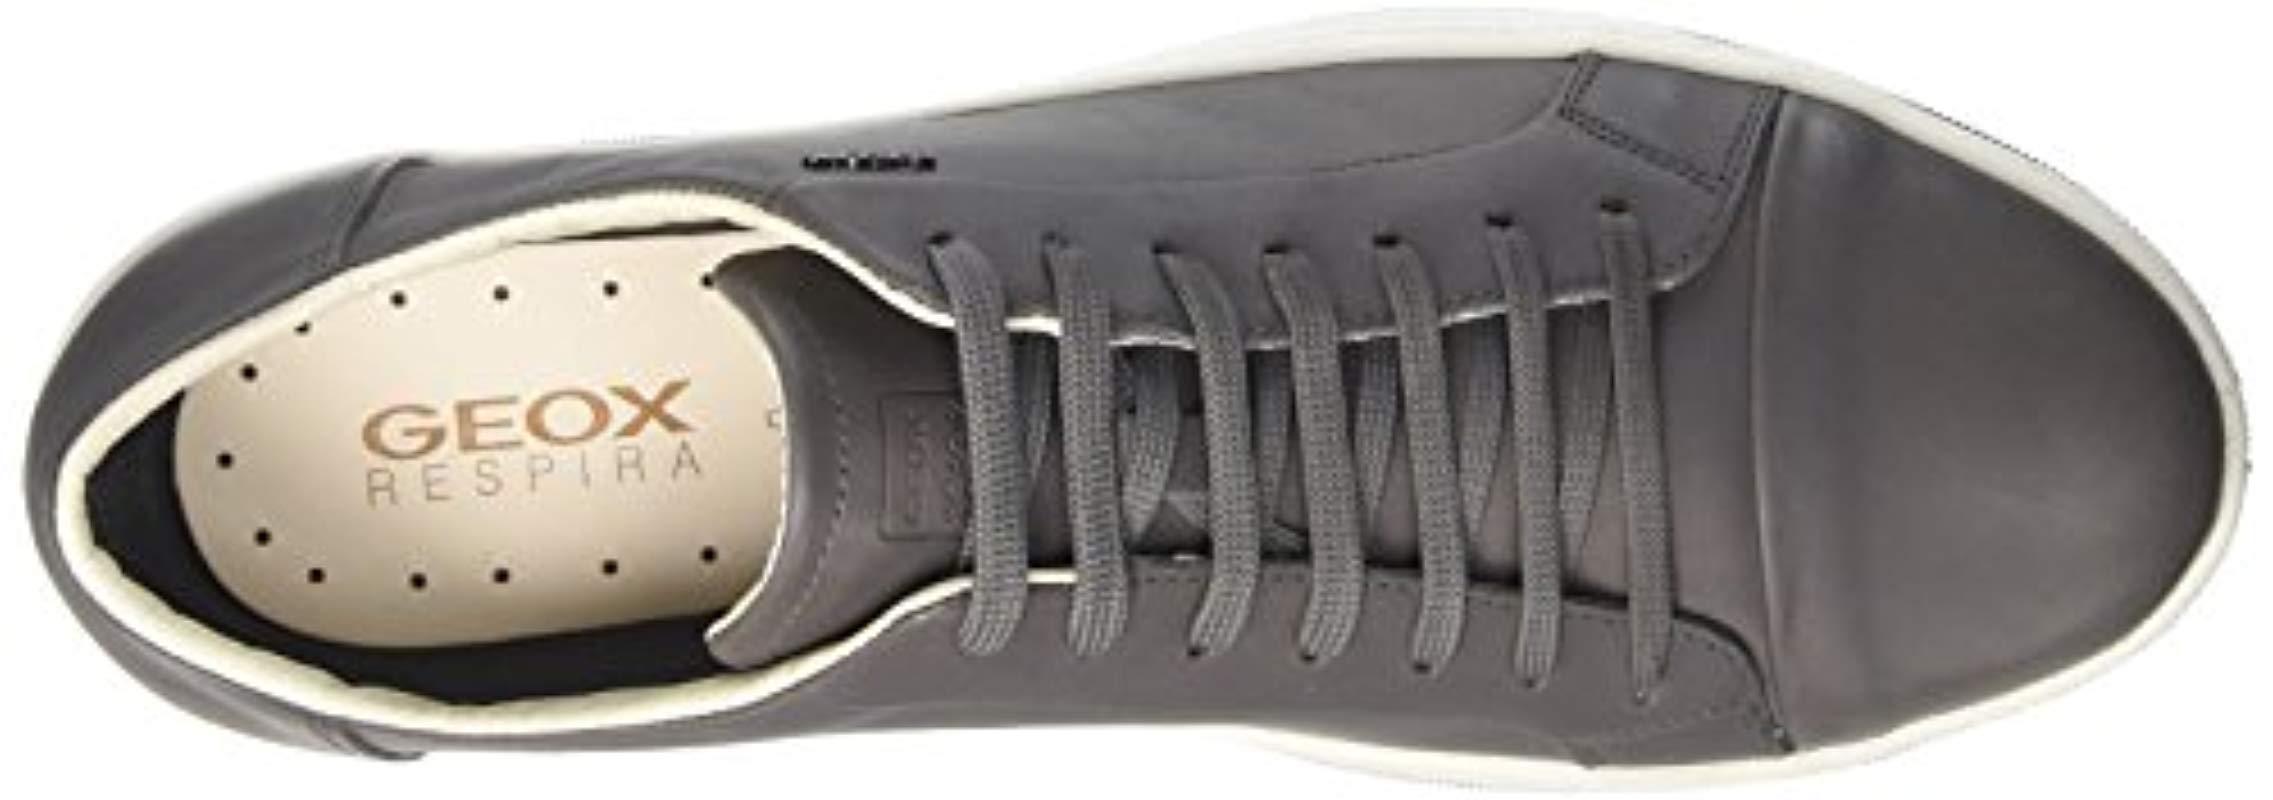 Excelente Degenerar Extranjero  Geox Uomo Ricky A Low-top Sneakers in Grey for Men - Lyst